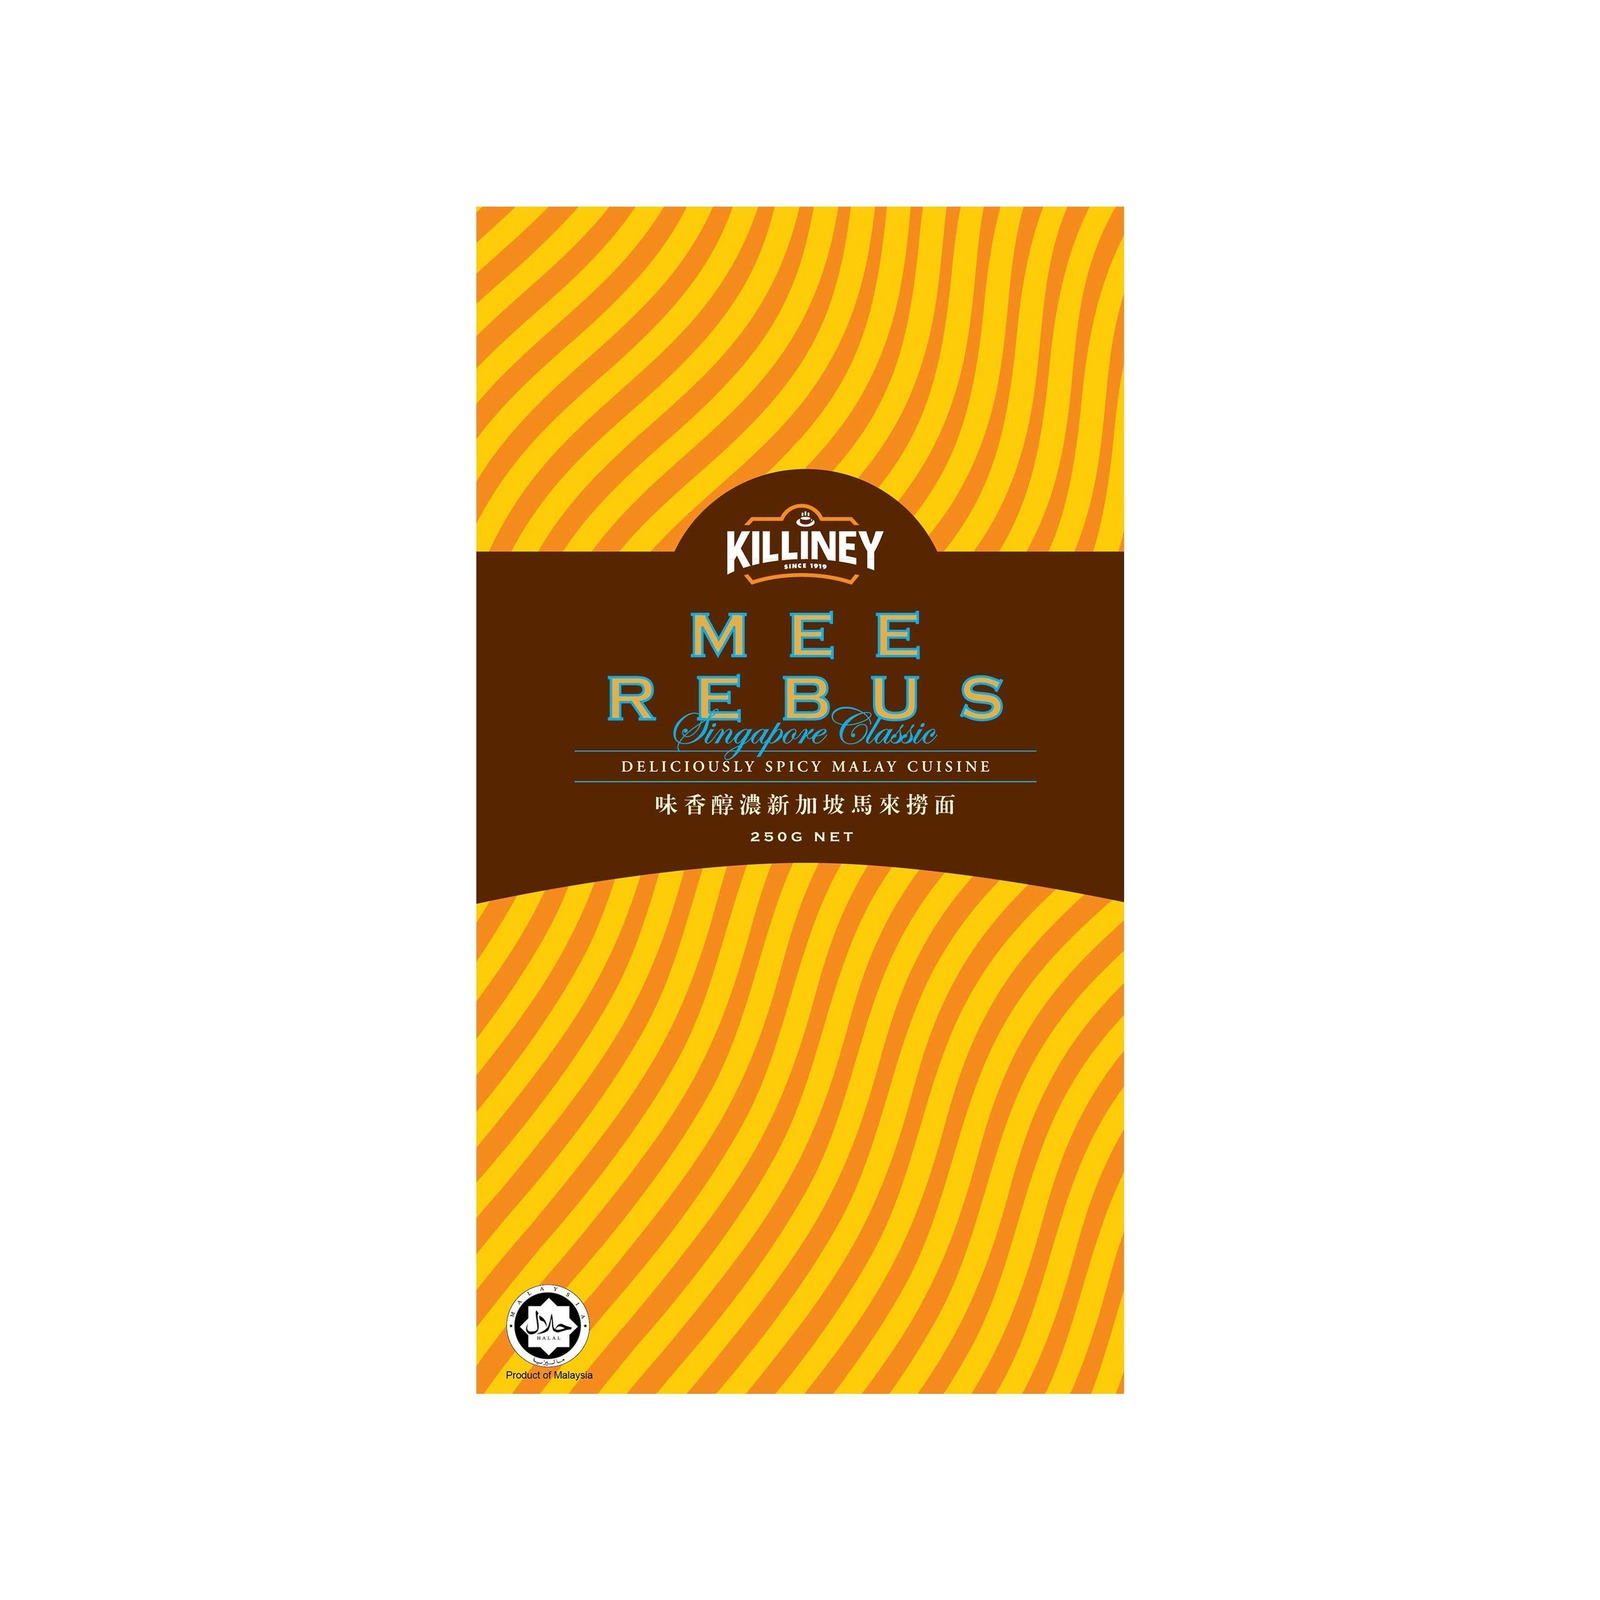 Killiney Mee Rebus Paste